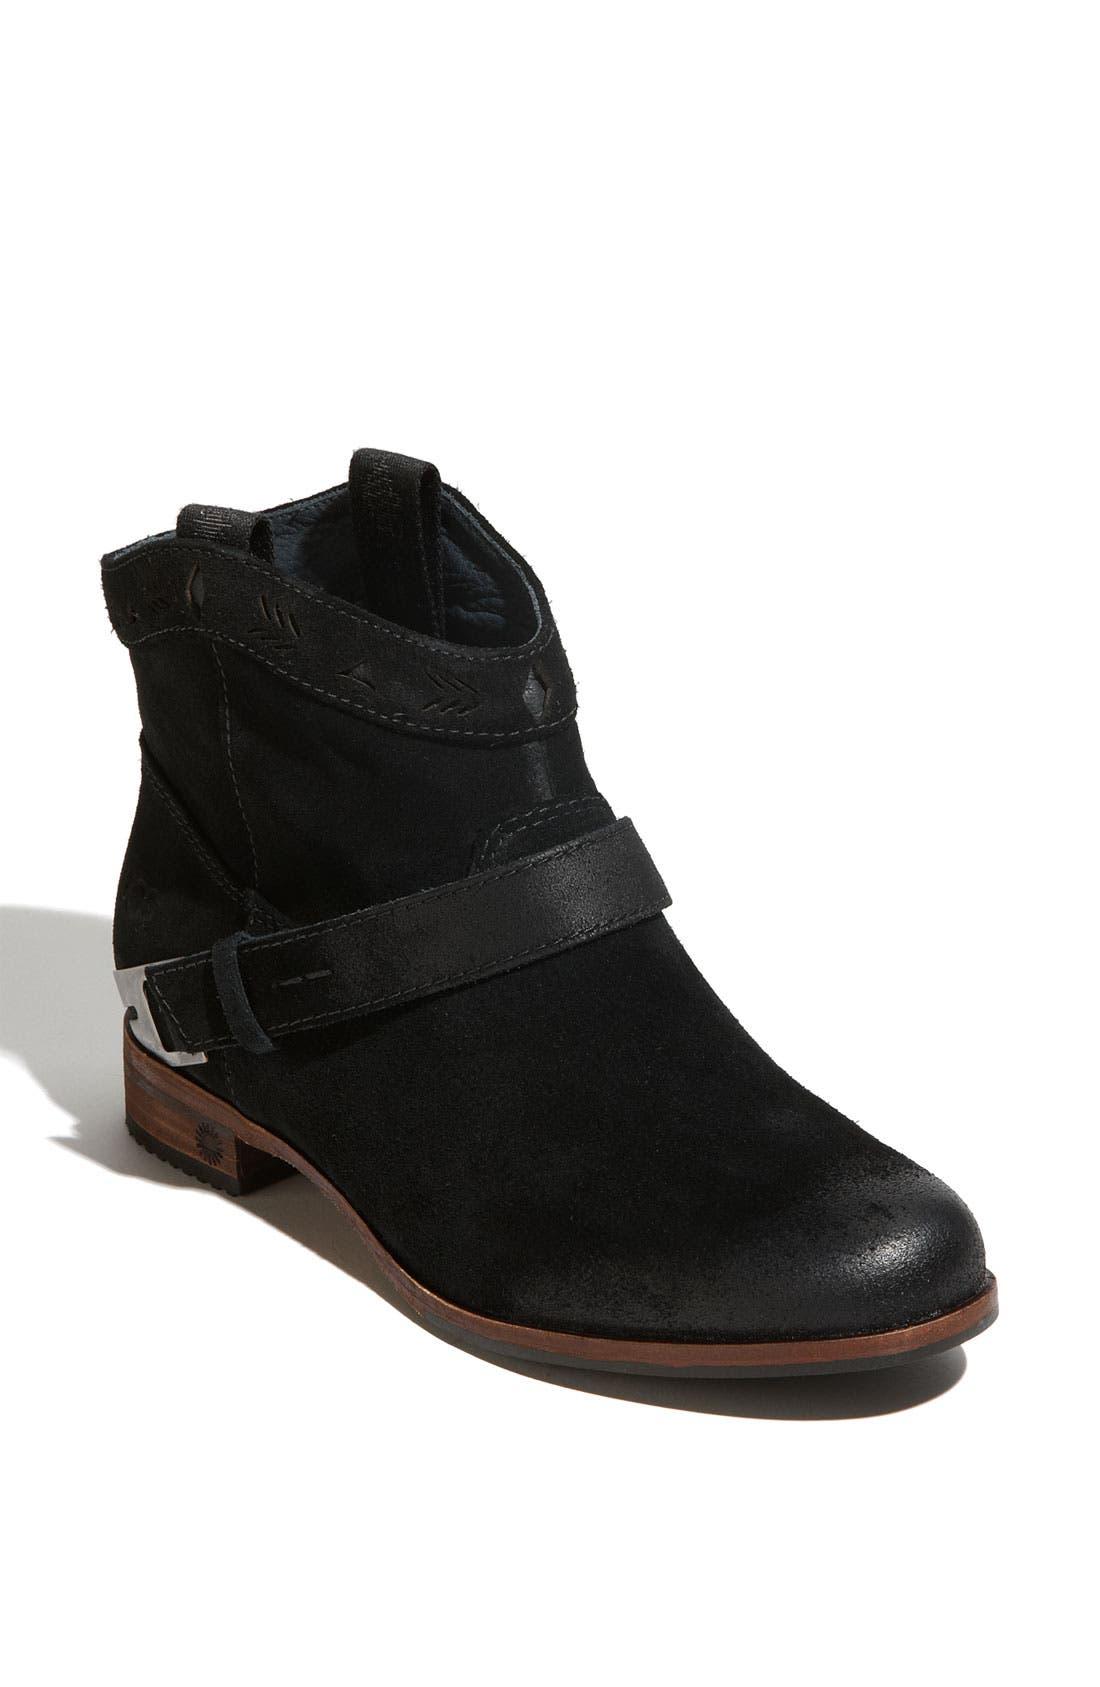 Australia 'Austin' Ankle Boot, Main, color, 001